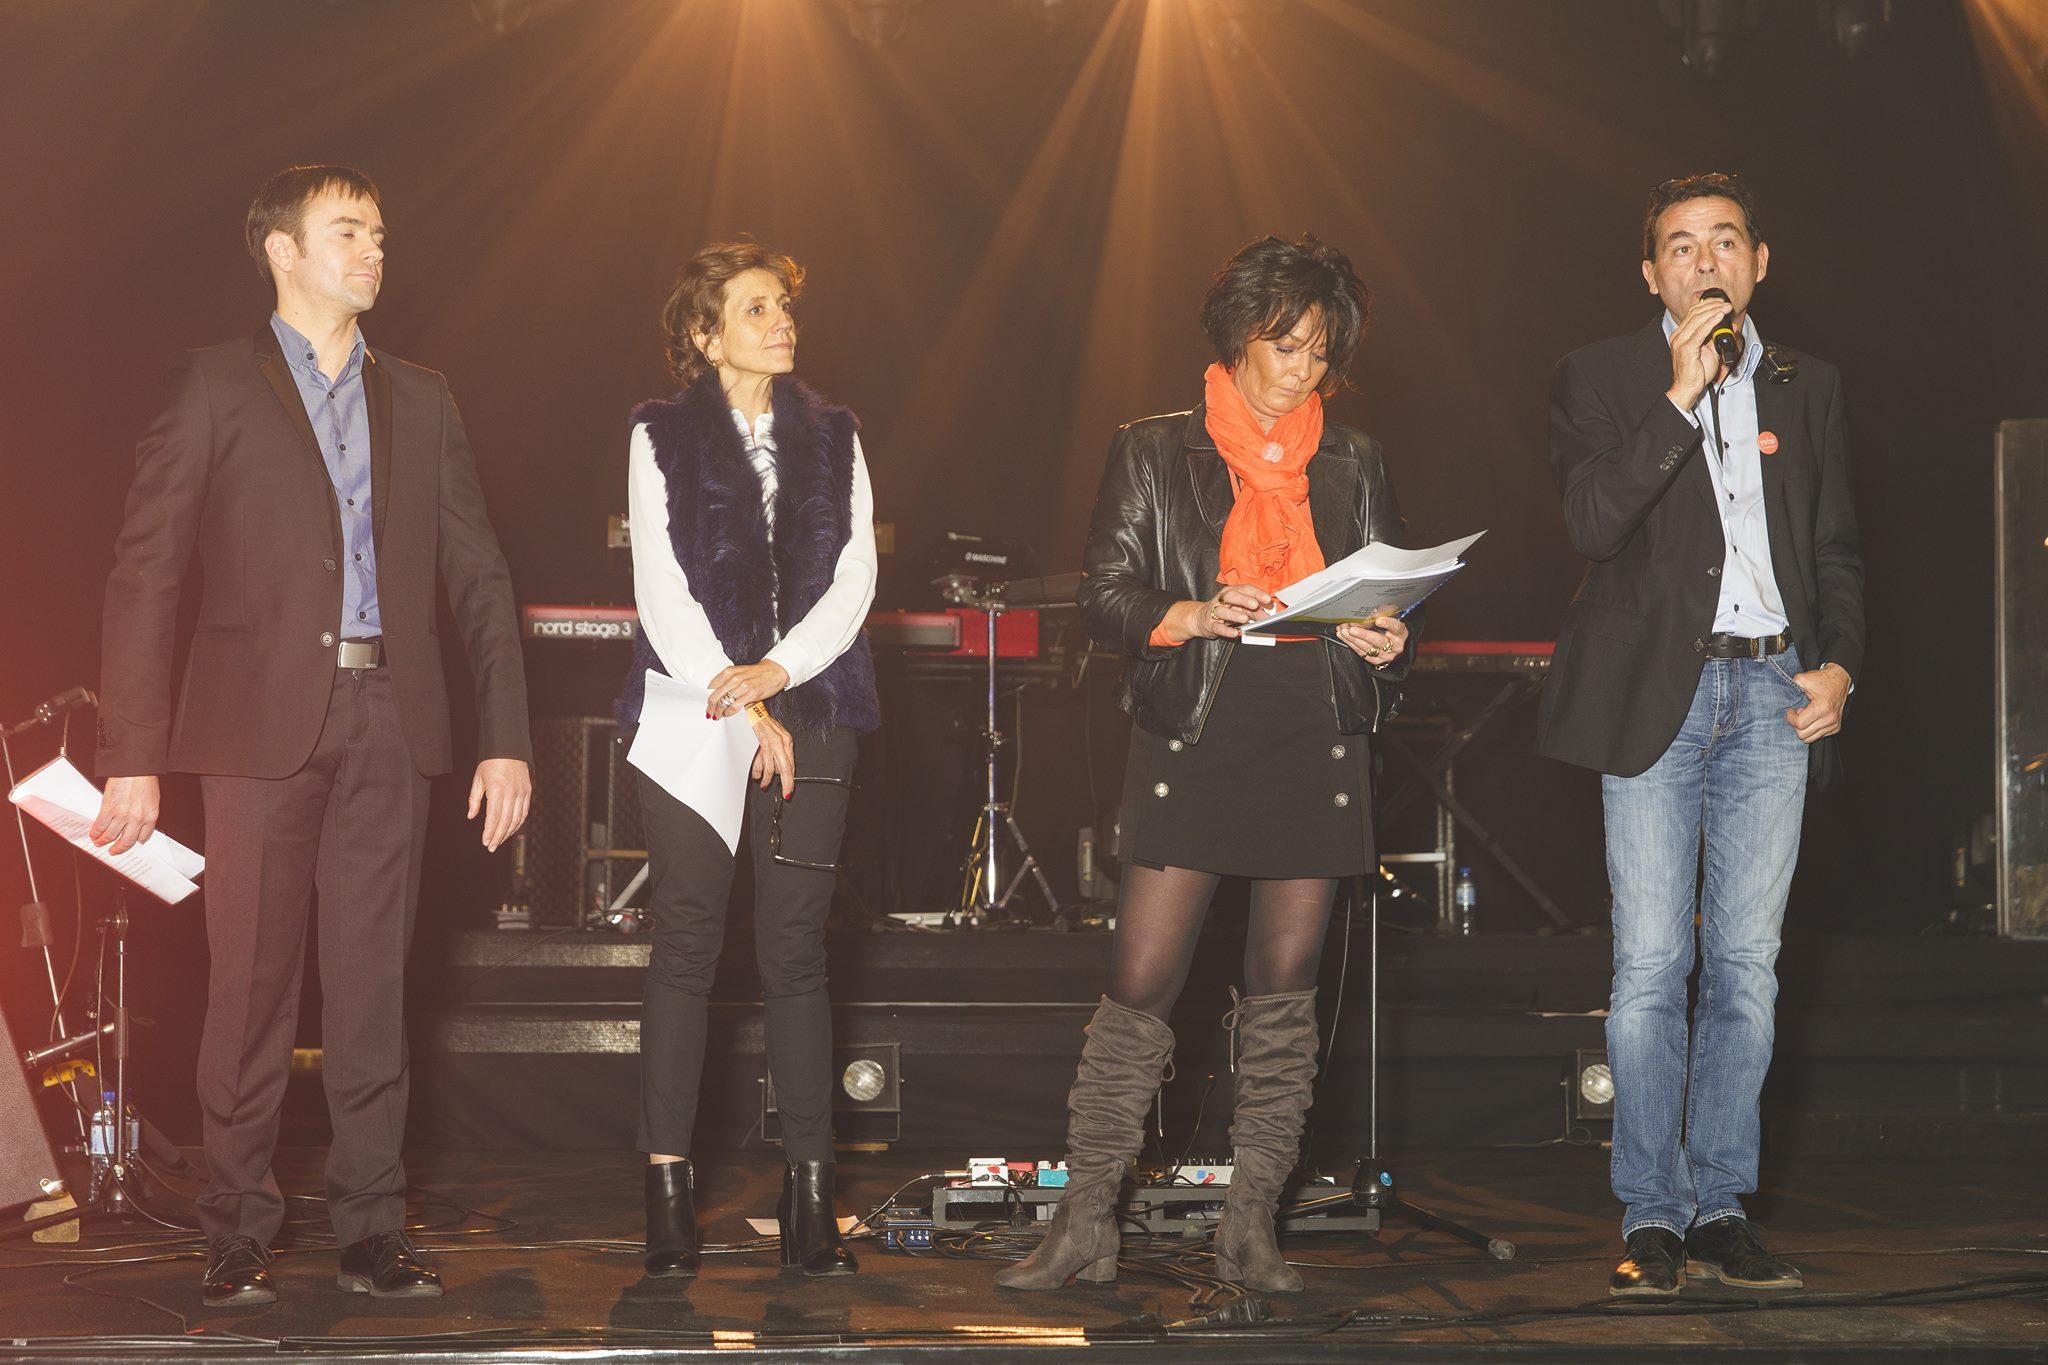 Le Tube - Les Bourdaines - Corinne Barbasso - Bruas, Didier Viricel, Lionnel Camblane,